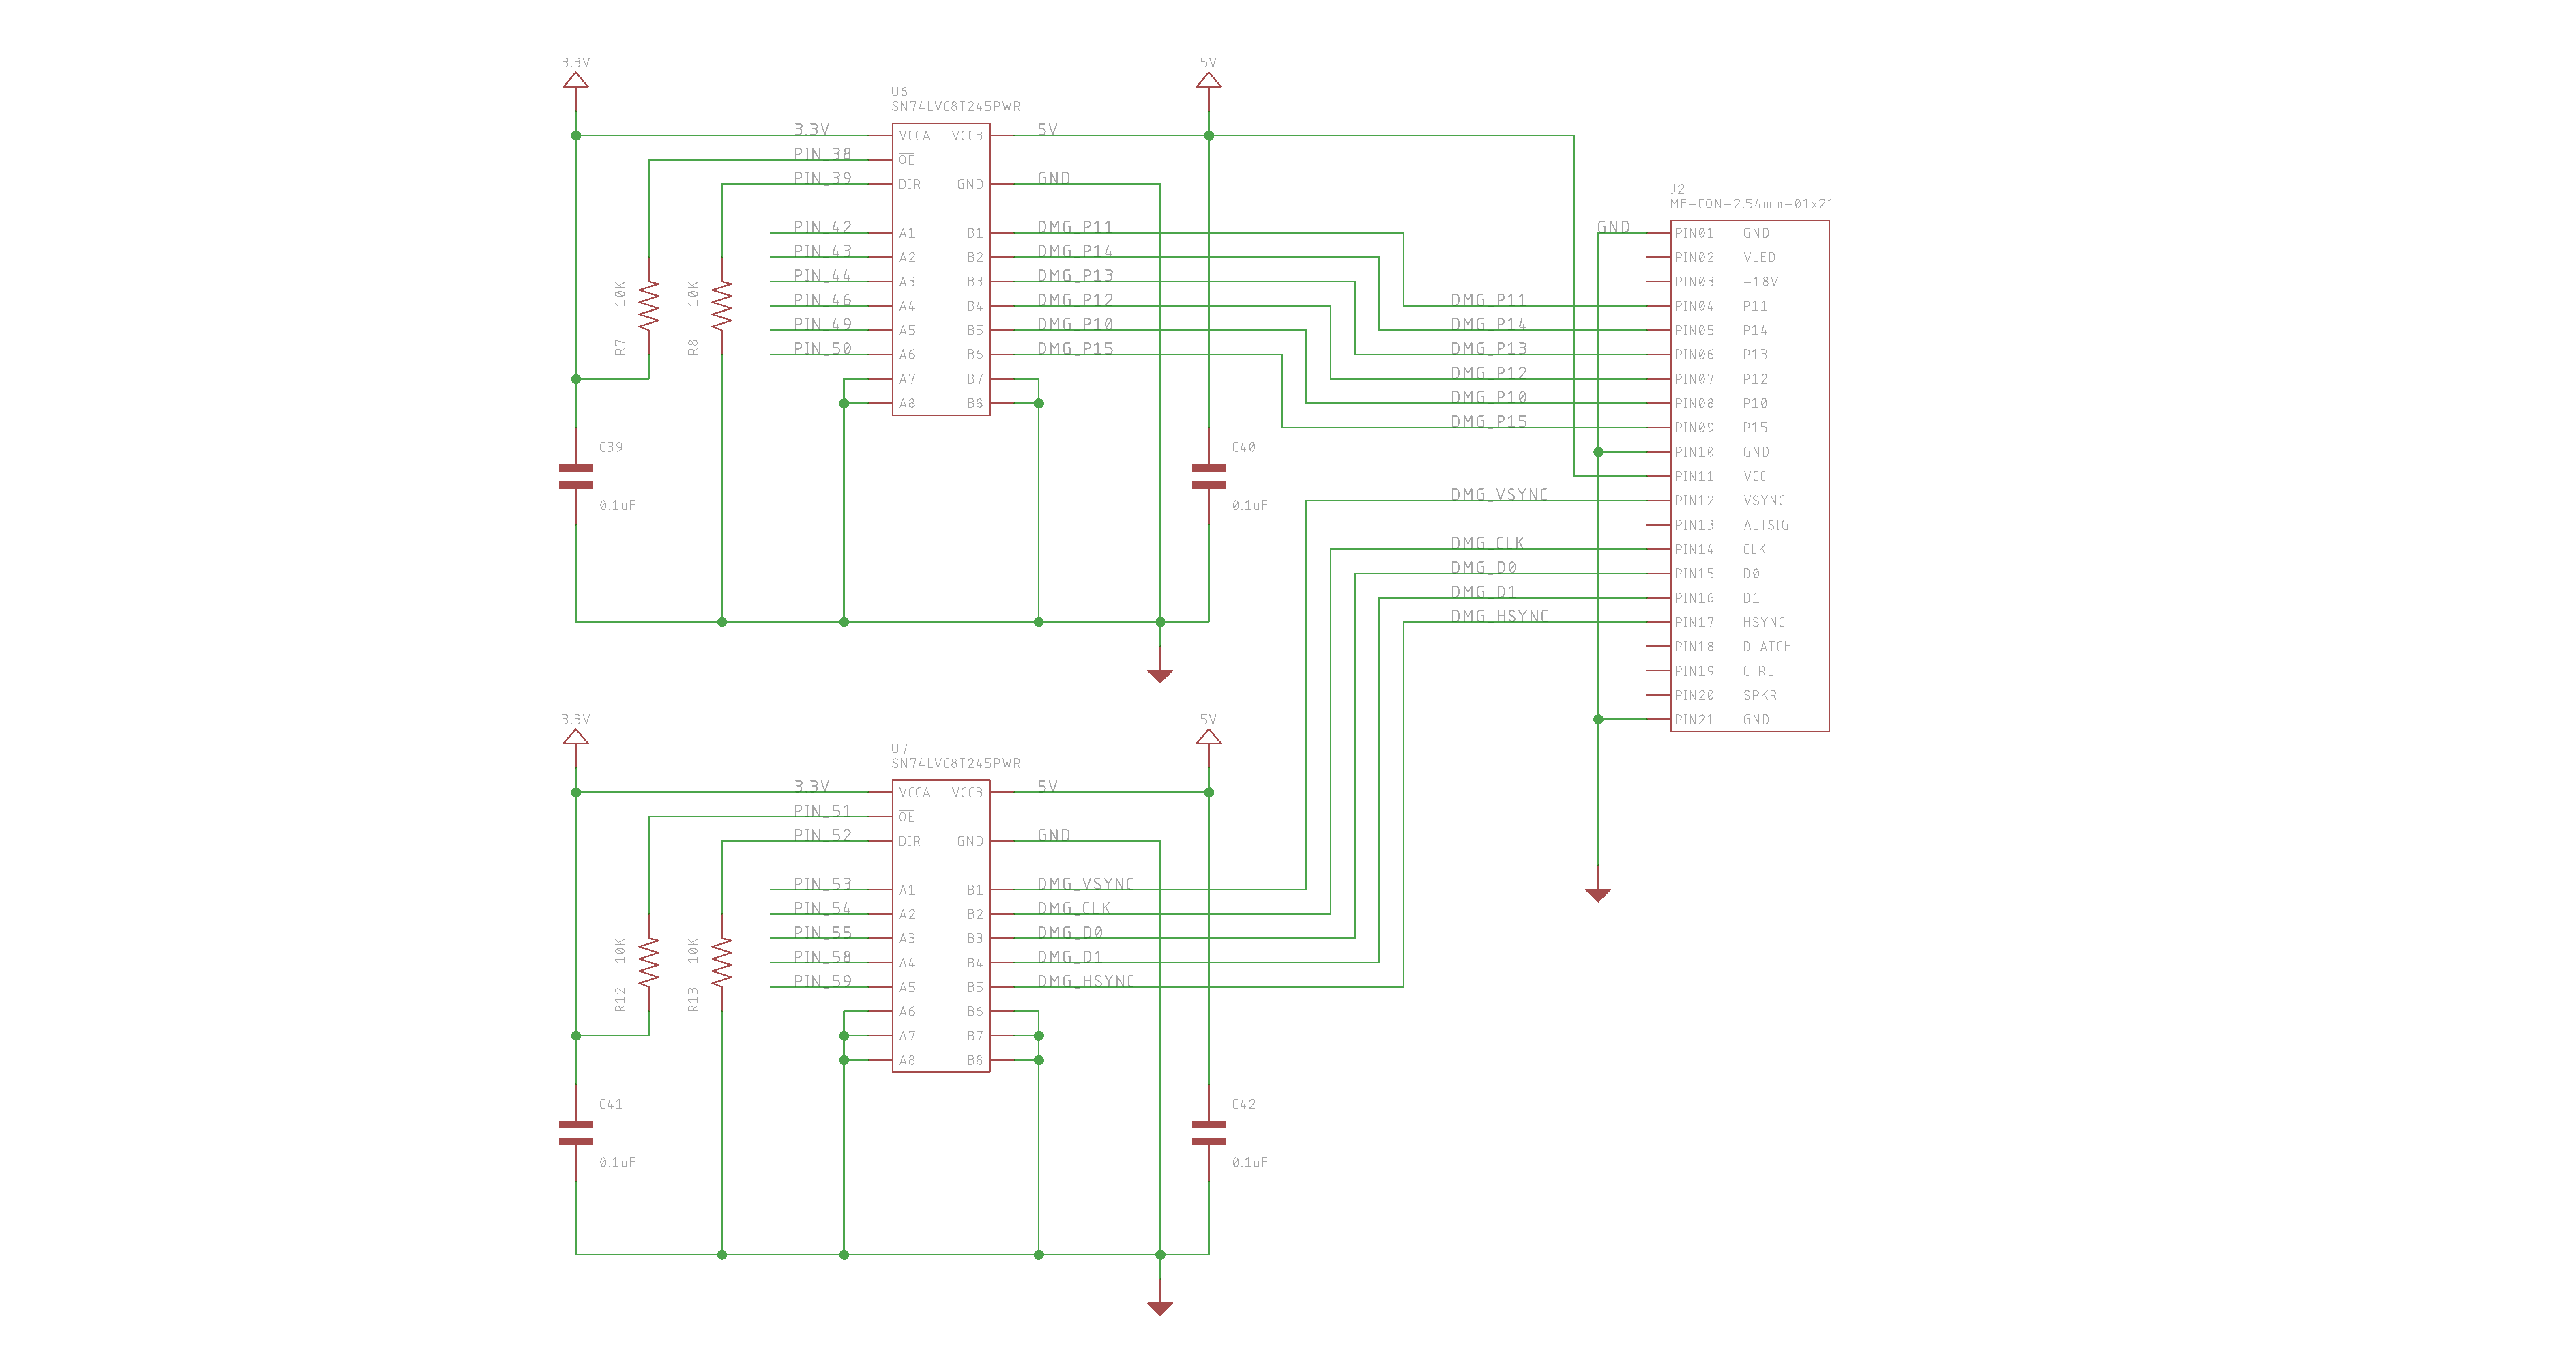 Gameboy Dmg 01 Vga The Longhorn Engineer Levelshiftercircuitdiagbmp Mod Voltage Level Shifter Section